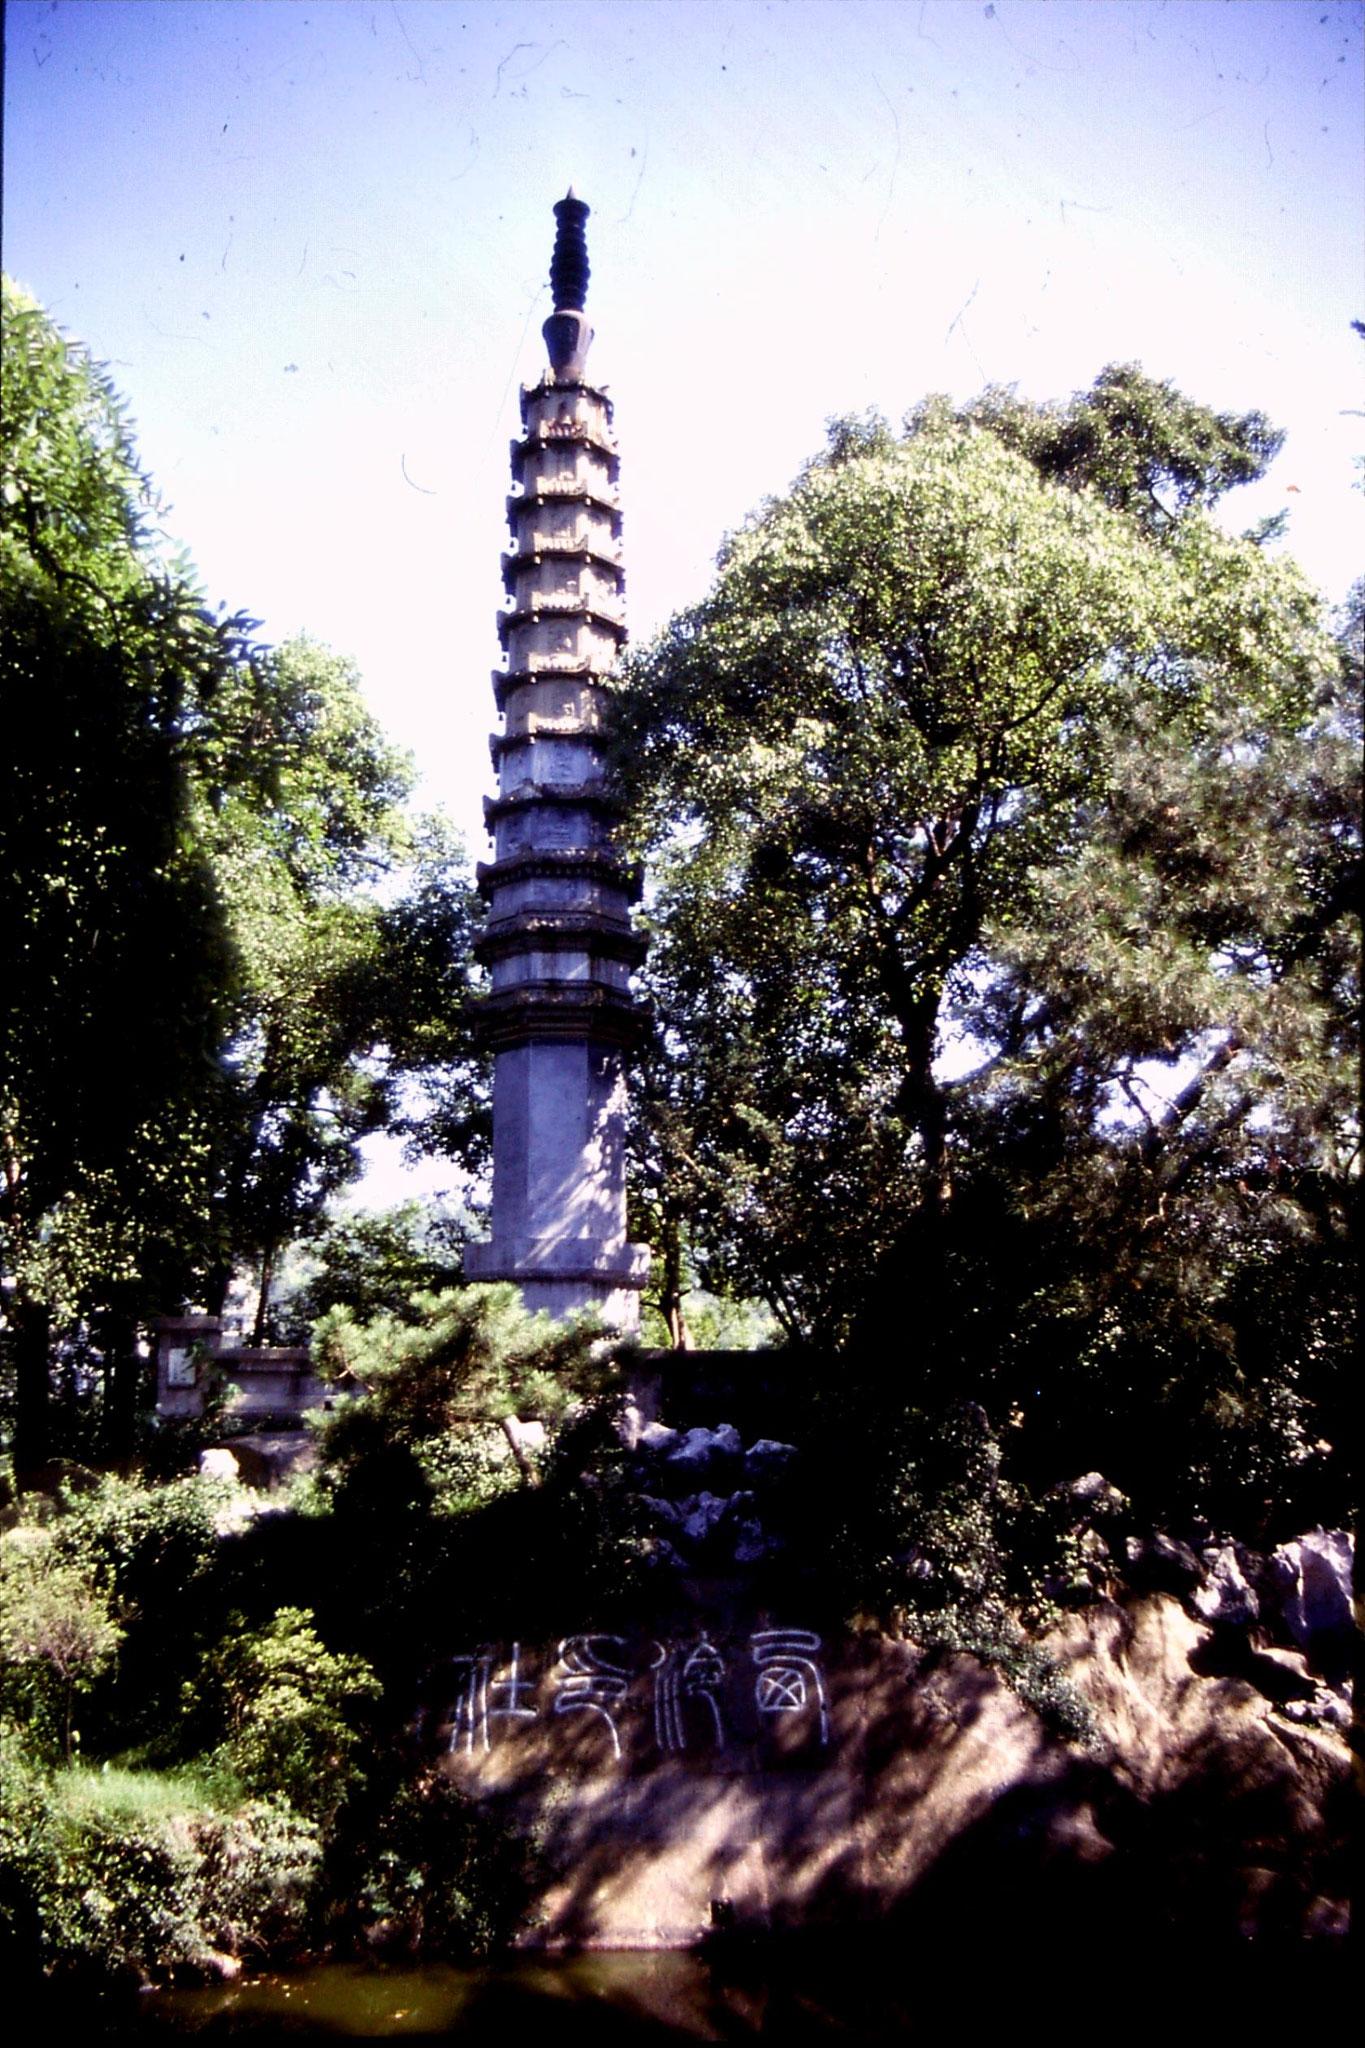 16/7/1989: 27: Zhang Shan park